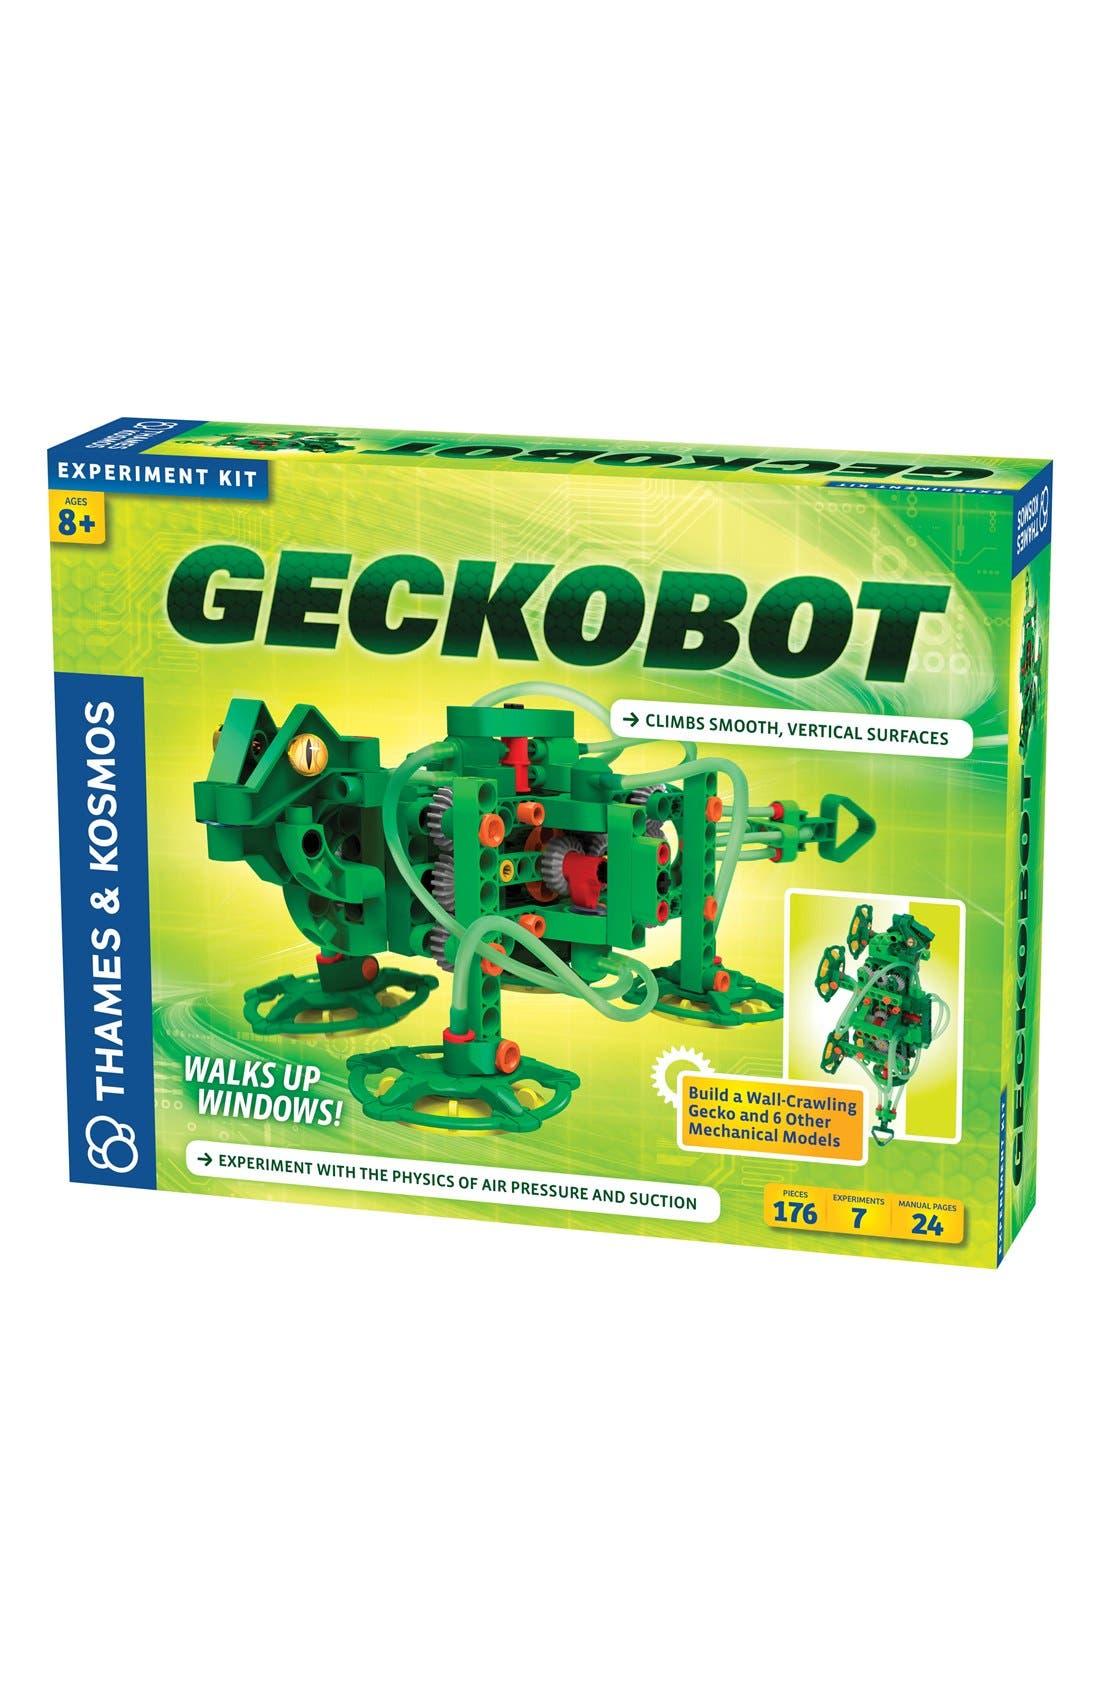 Main Image - Thames & Kosmos 'Geckobot' Robotics Experiment Kit